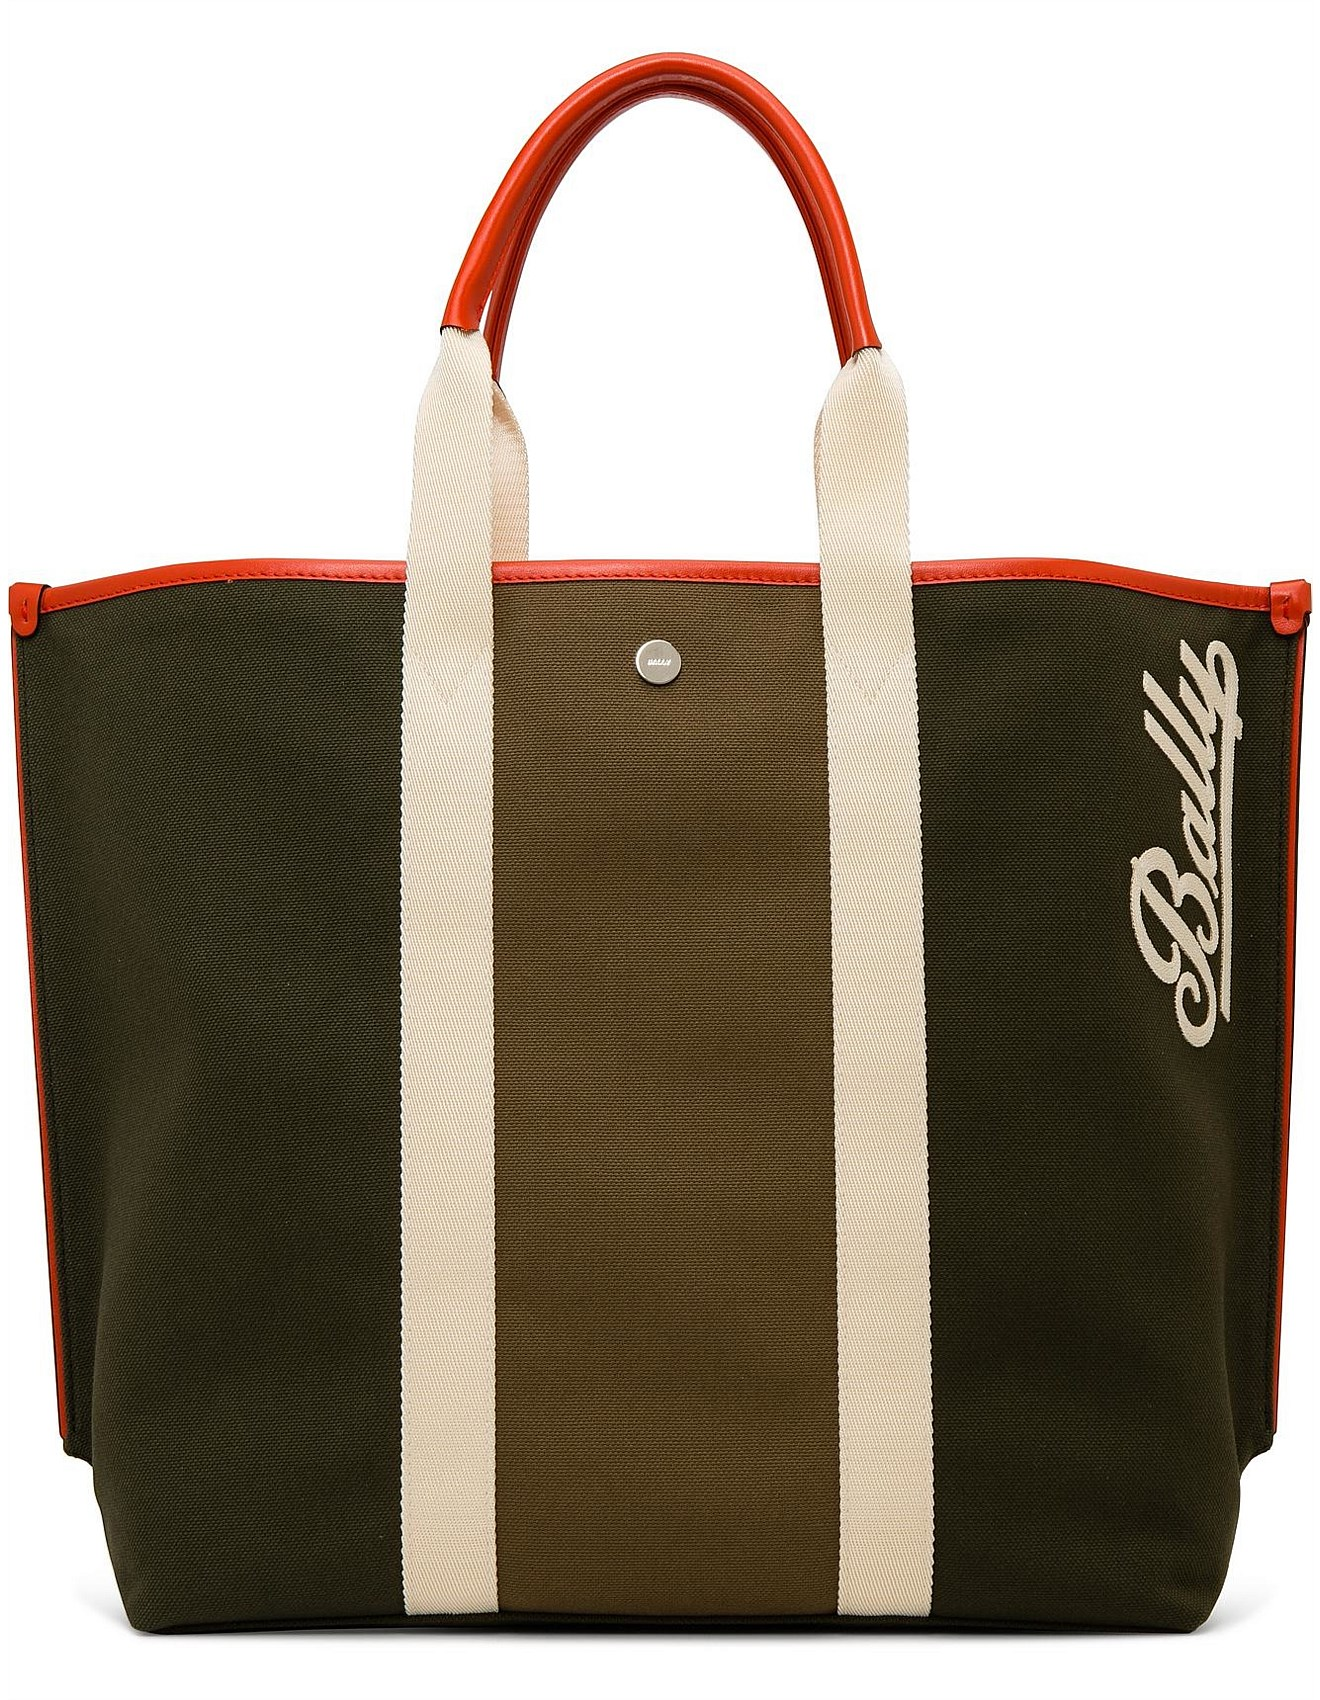 487b0b9b8 Bally | Buy Bally Shoes, Wallets & More Online | David Jones ...